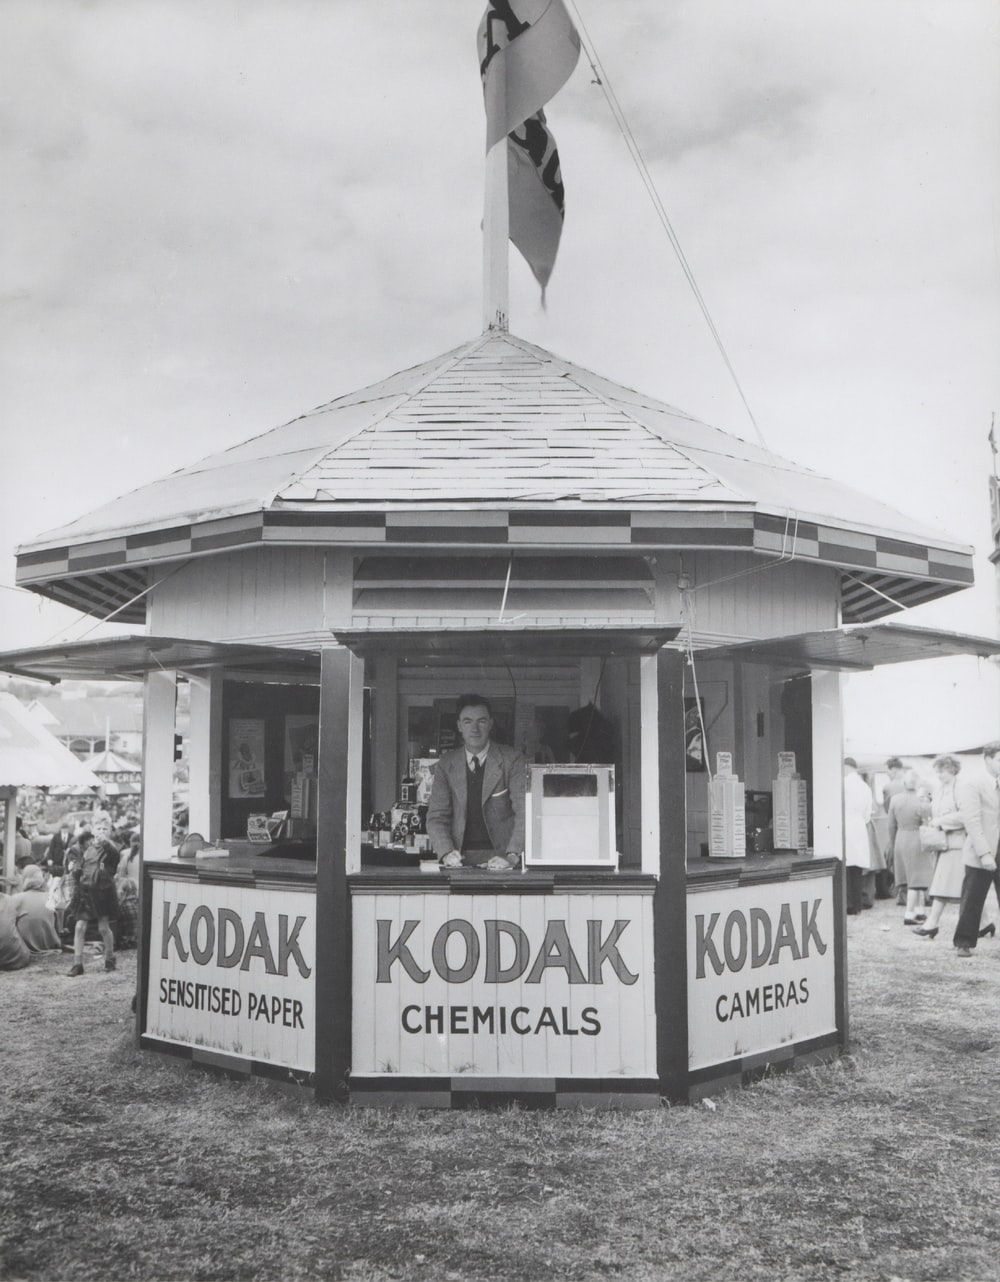 Kodak Chemicals shed